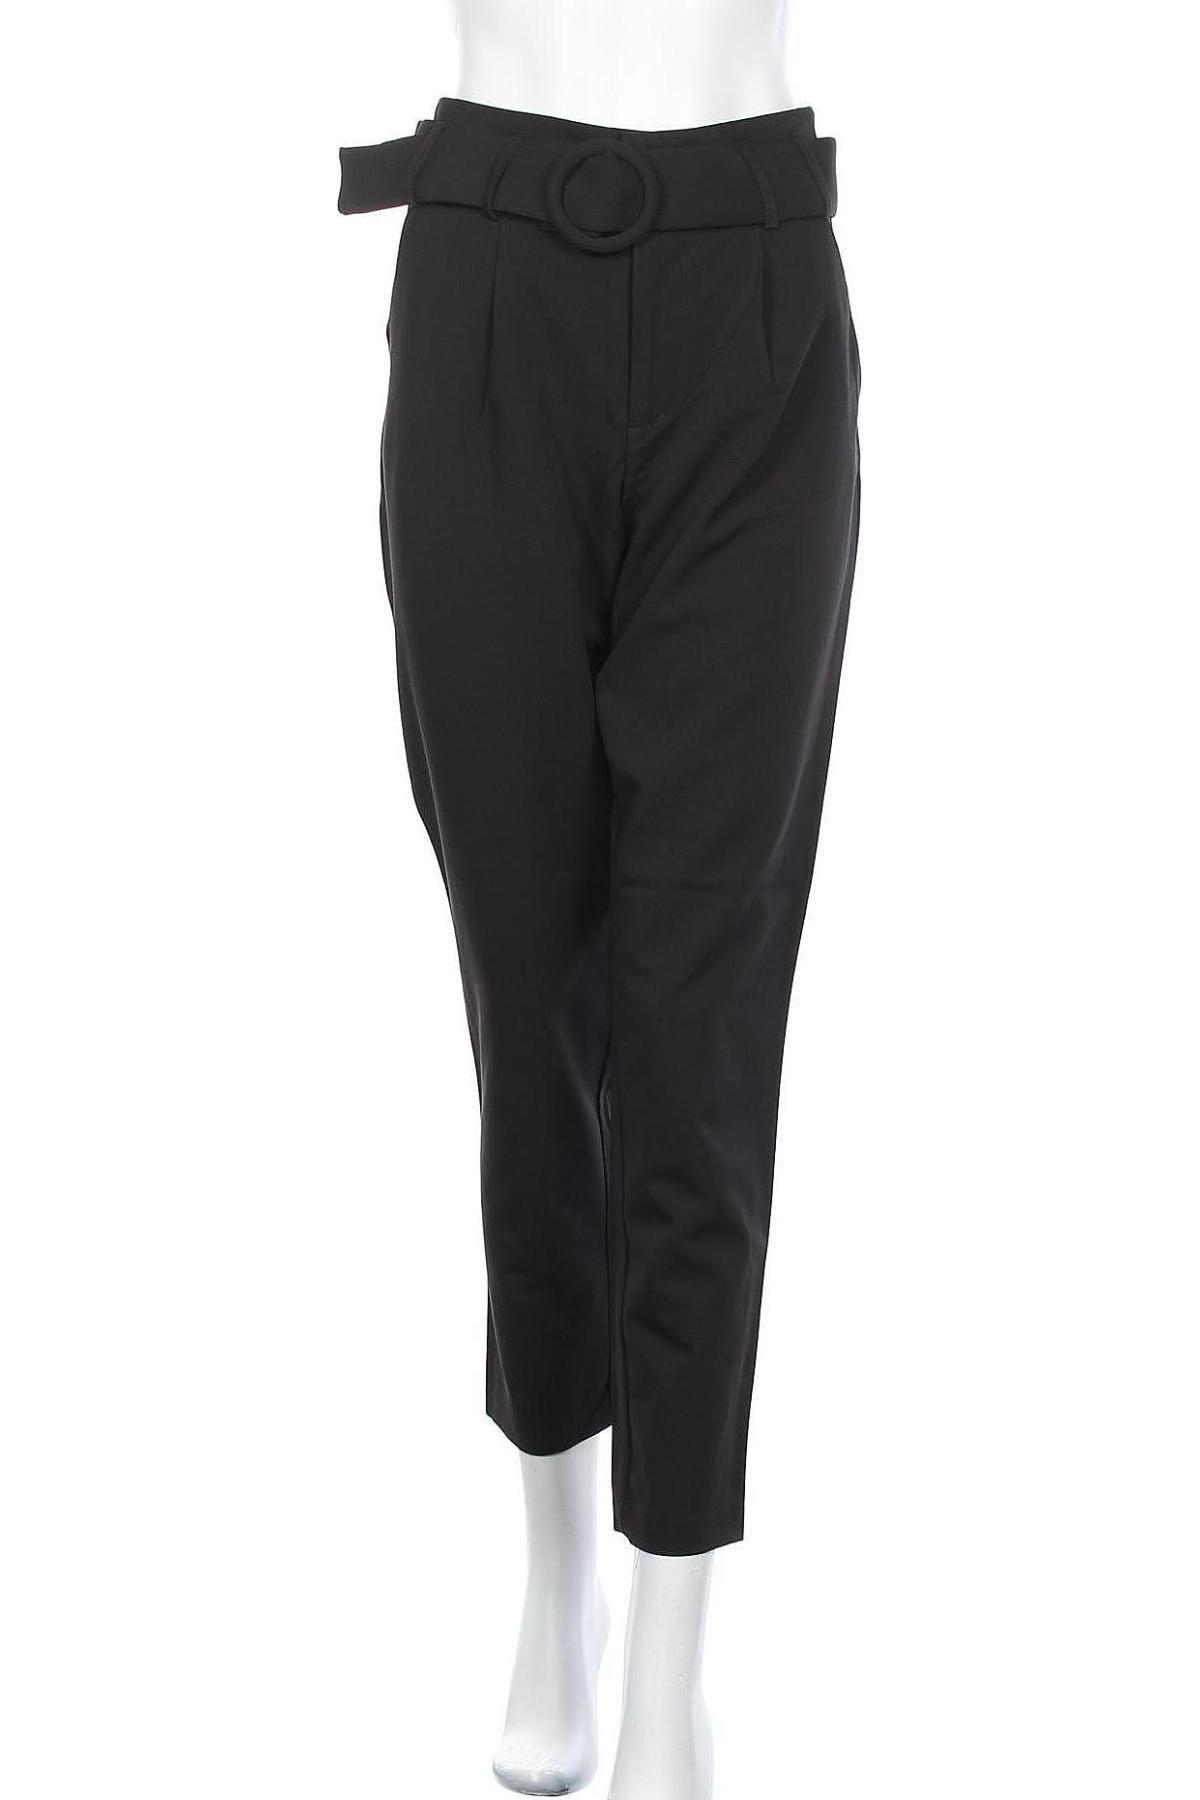 Дамски панталон ONLY, Размер S, Цвят Черен, 63% полиестер, 31% вискоза, 6% еластан, Цена 17,73лв.